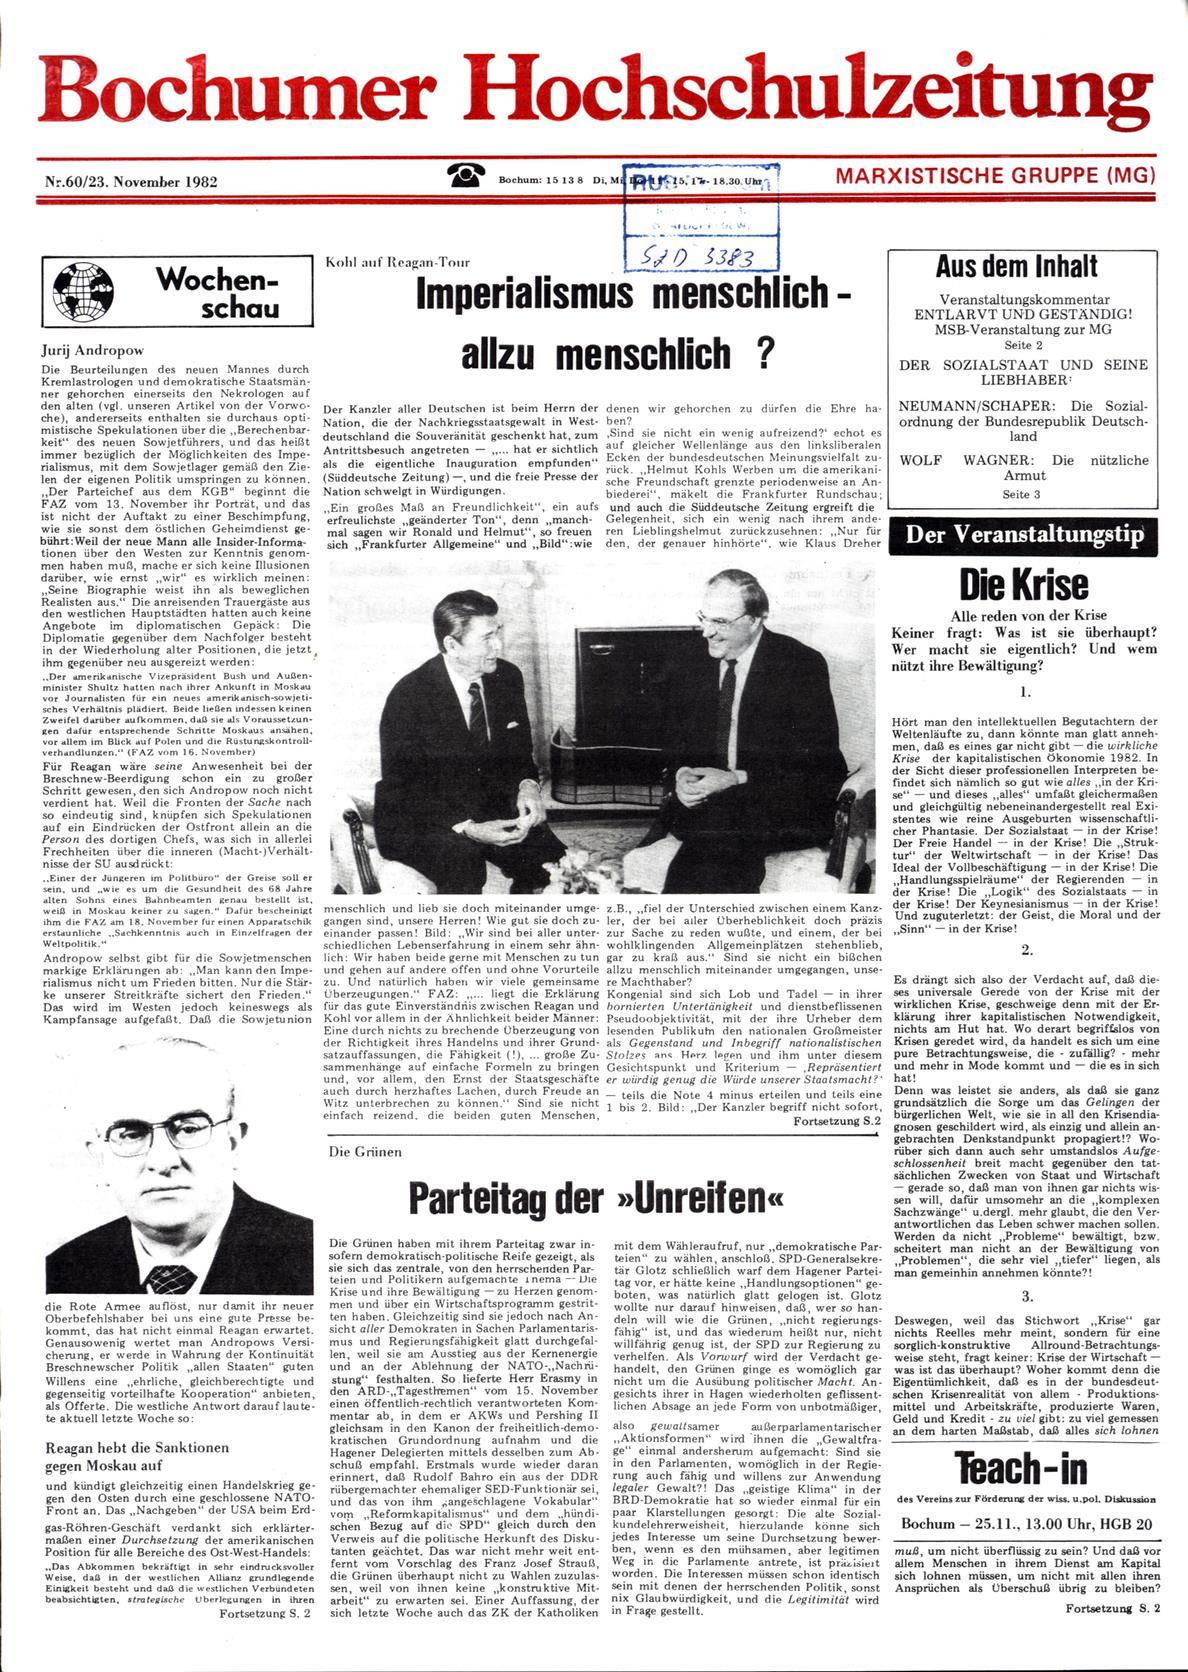 Bochum_BHZ_19821123_060_001